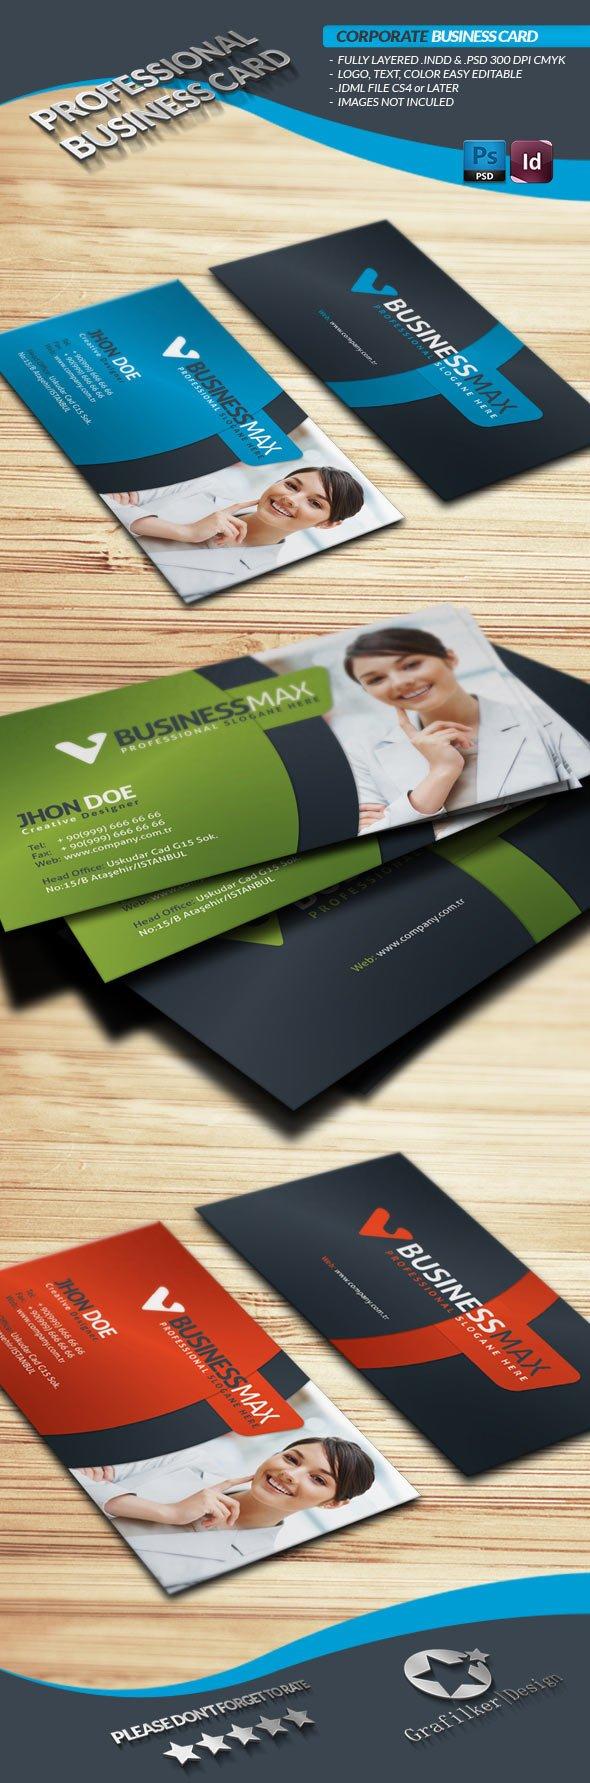 InDesign PremiumBusiness Card Template